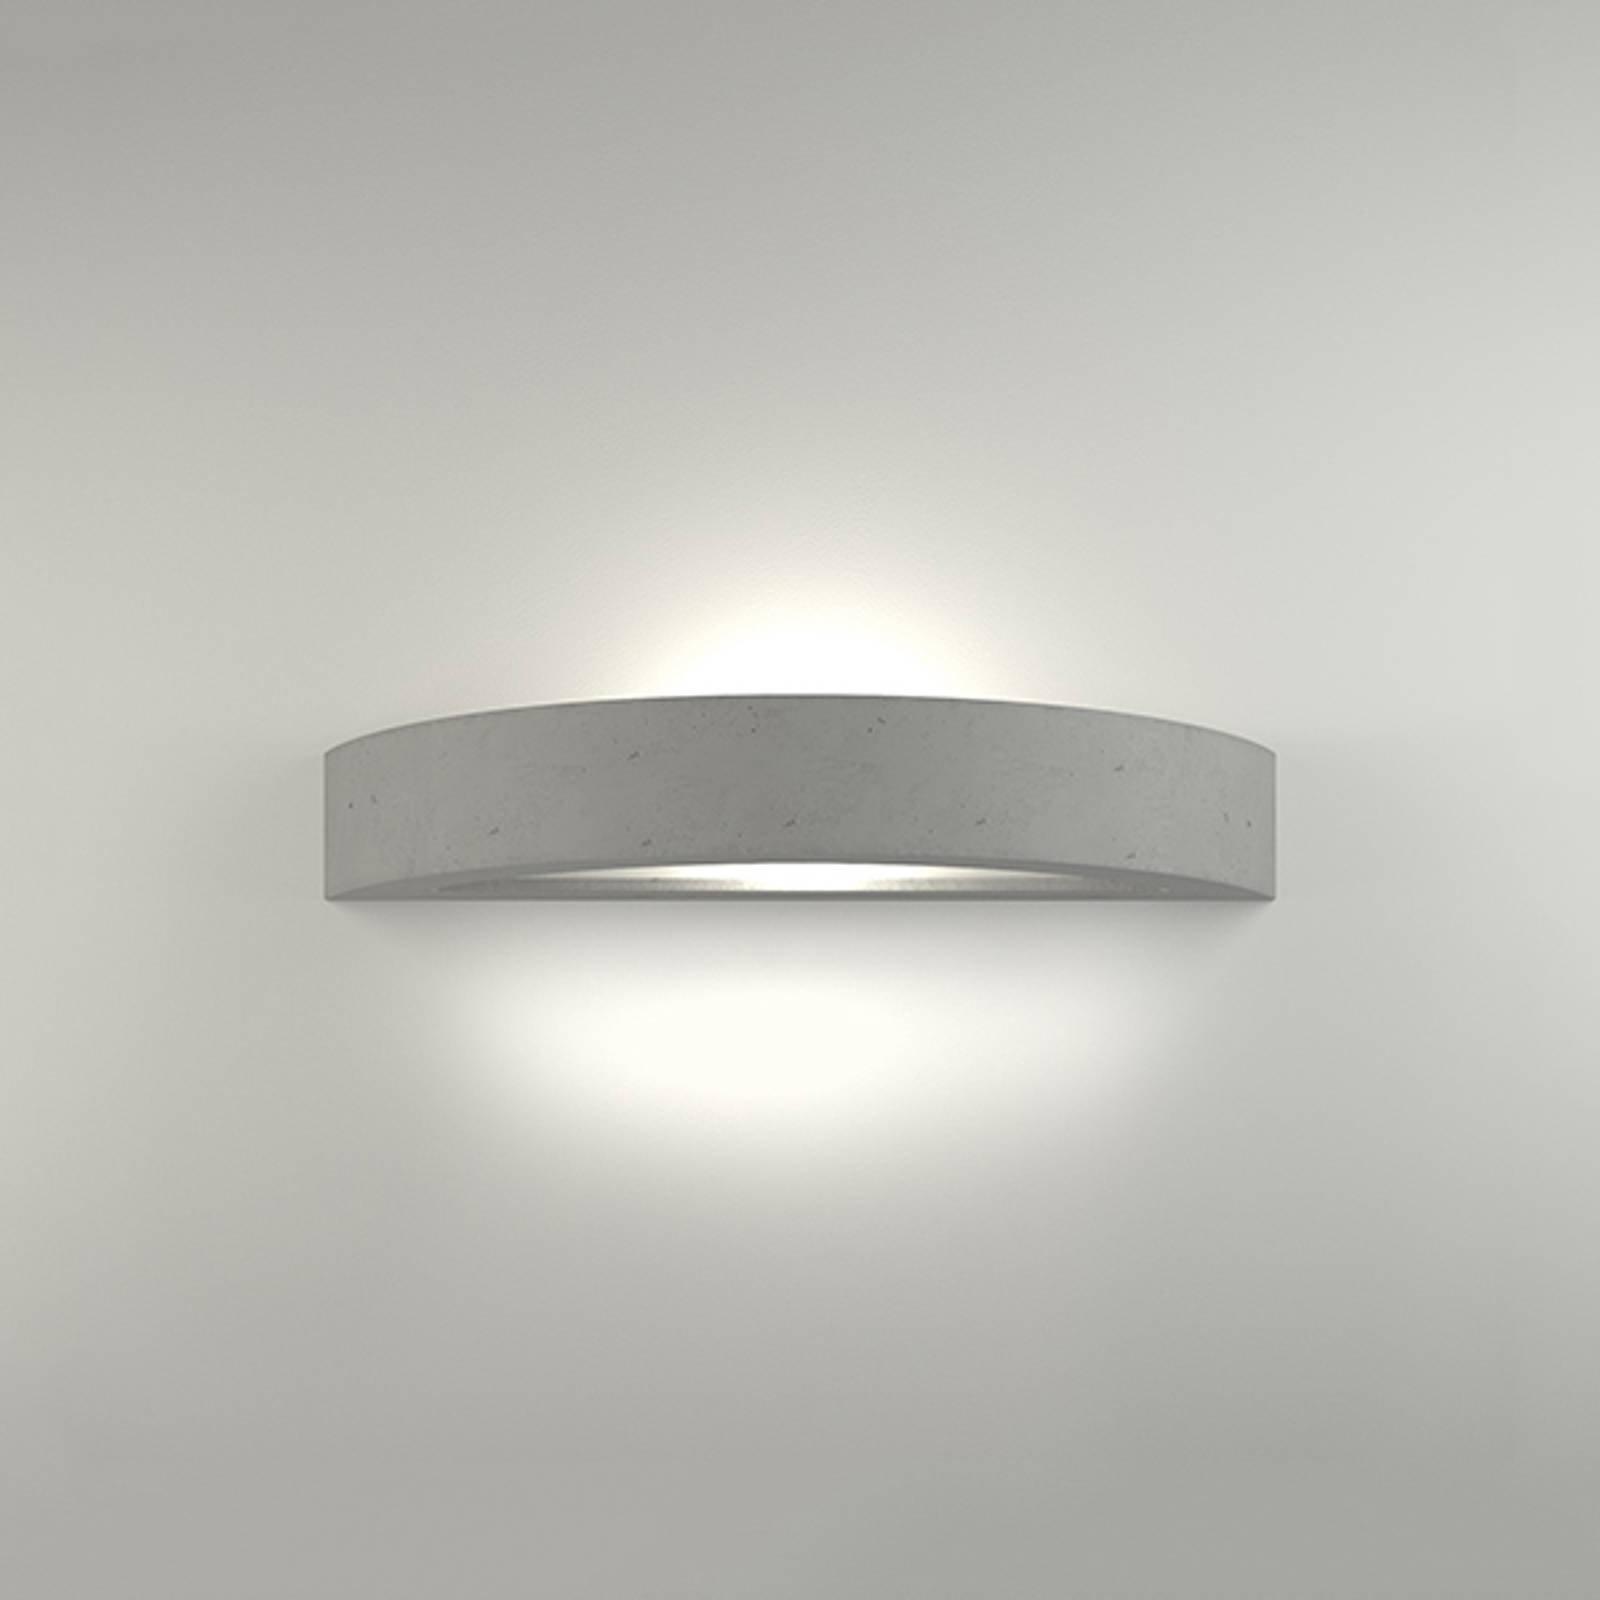 LED-vegglampe 2455 betong 3 000 K ikke-dimbar